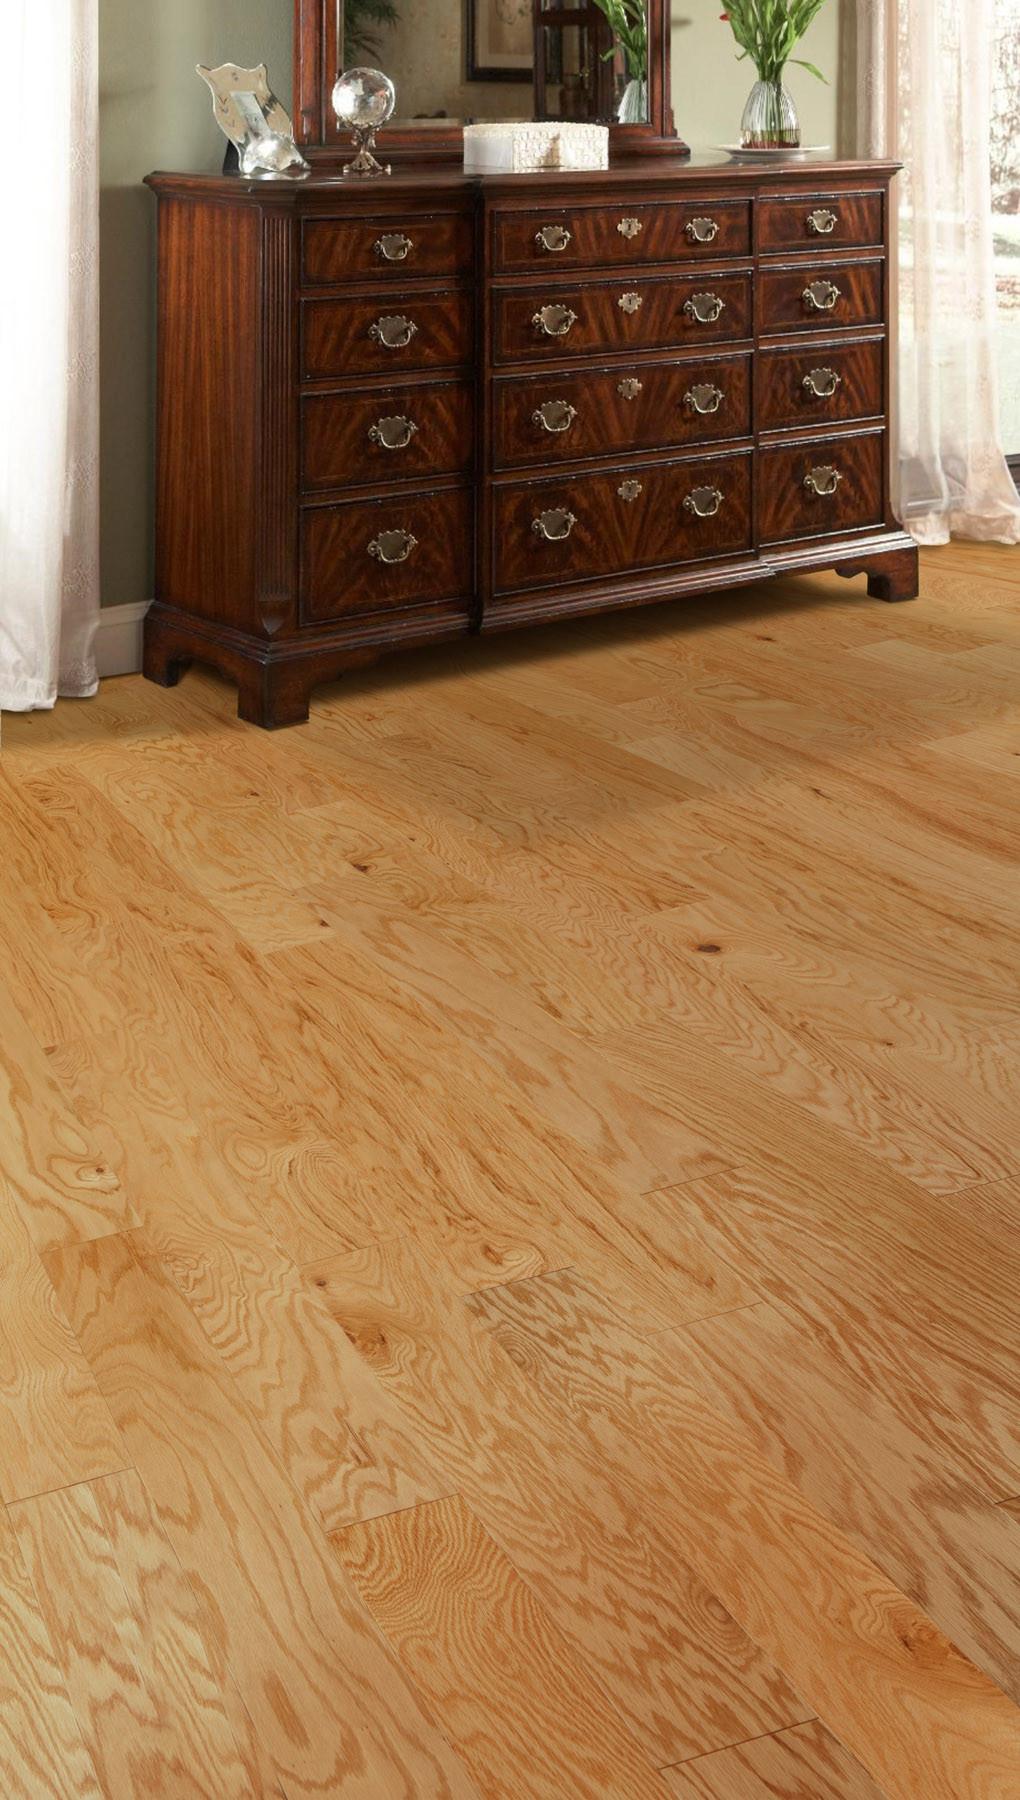 versini hardwood flooring reviews of lm flooring lm hardwood floors discount lm wood in town square engineered